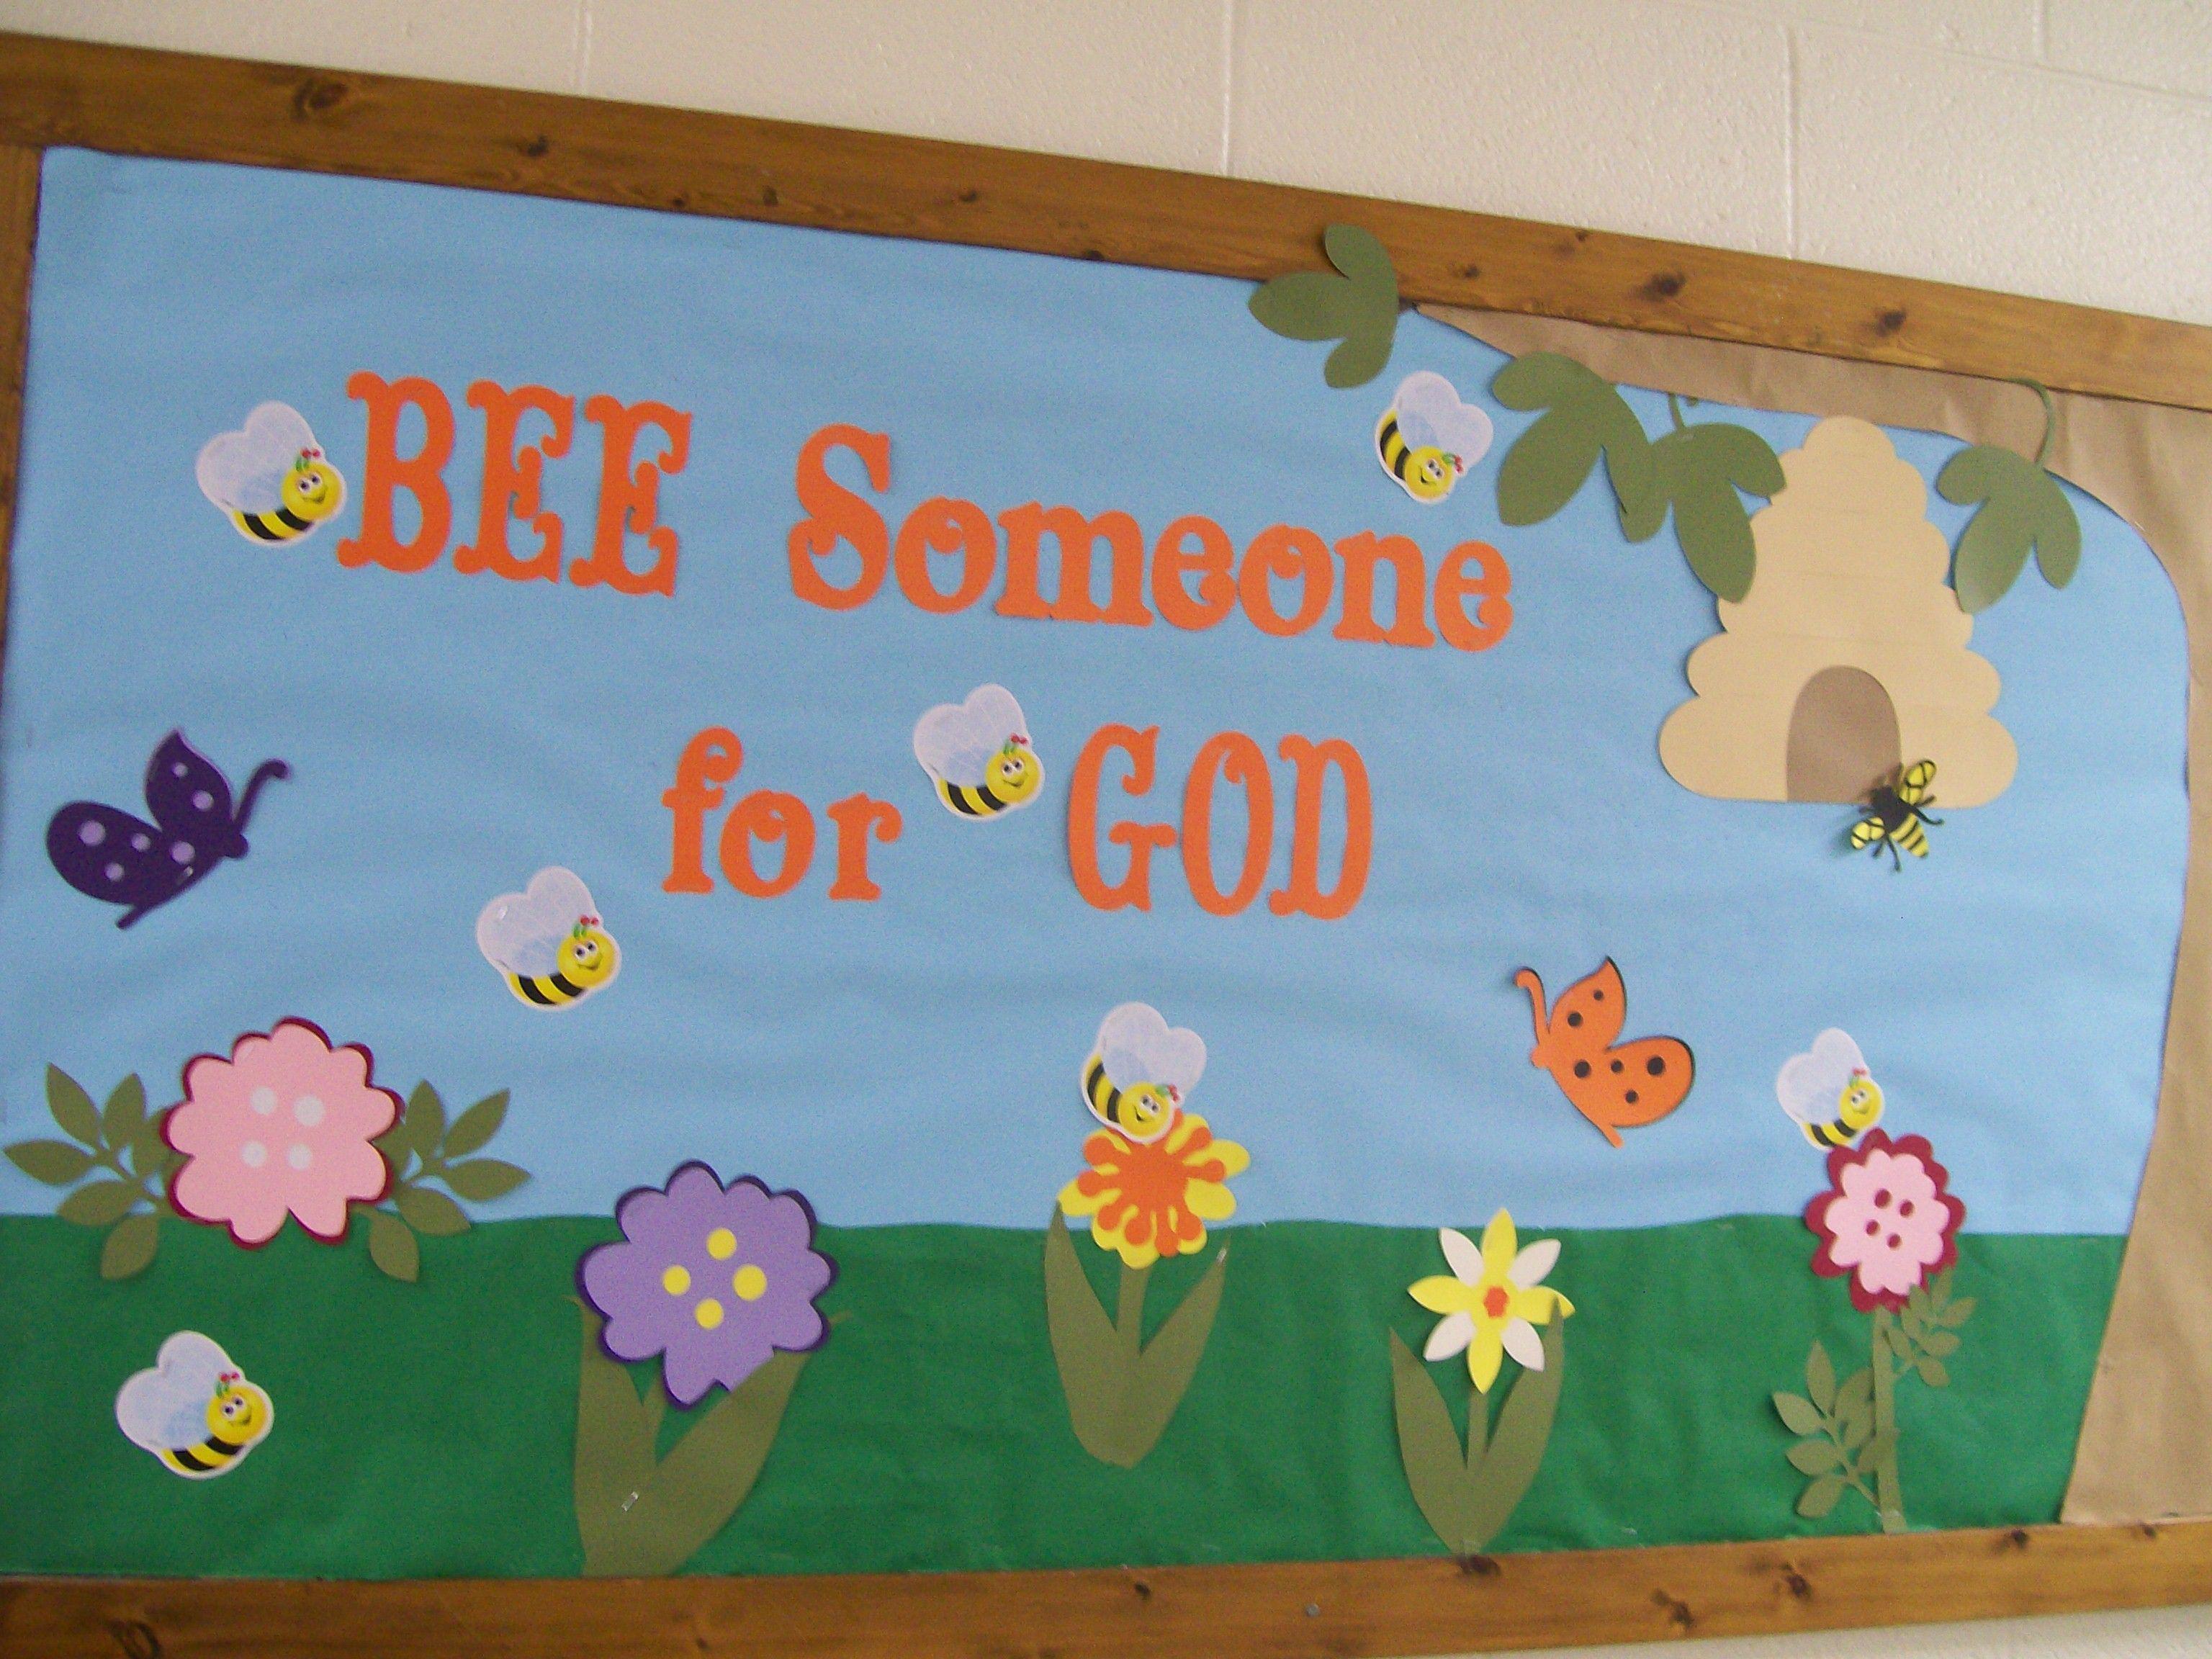 Summer board 2013 bulletin board ideas pinterest for Cork board decorating ideas pinterest